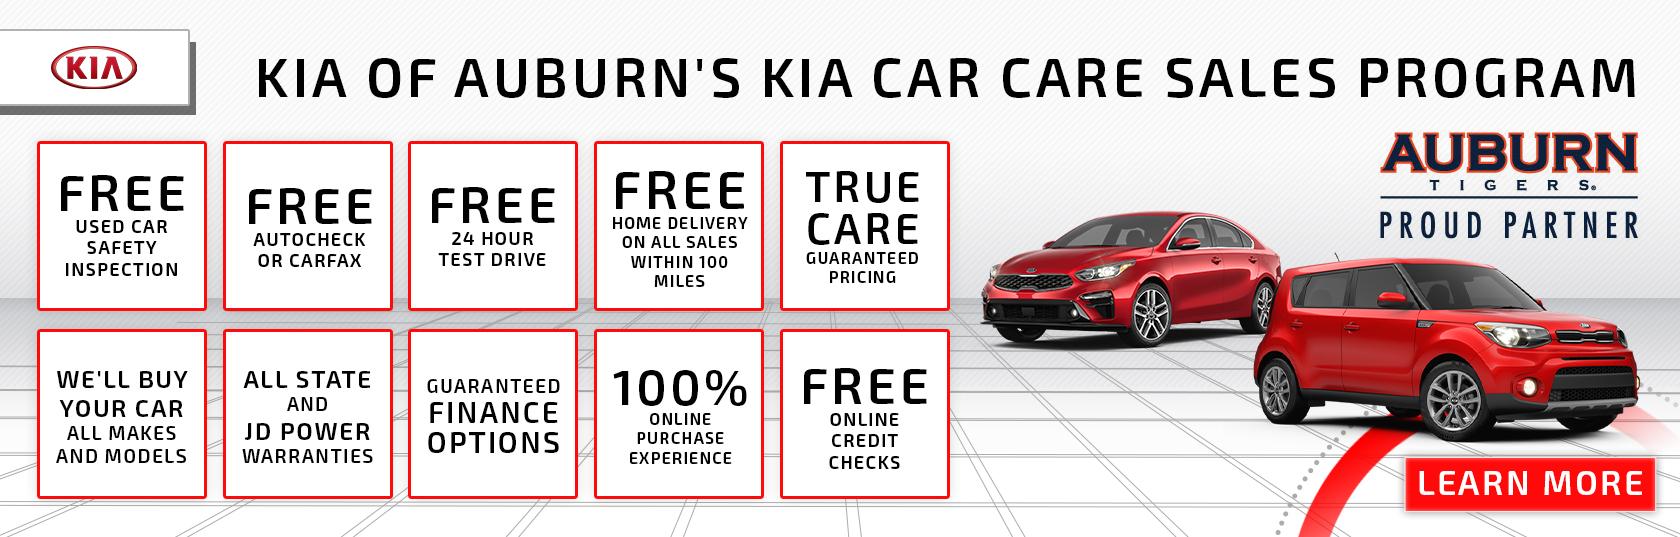 Kia Car Care Sales Program